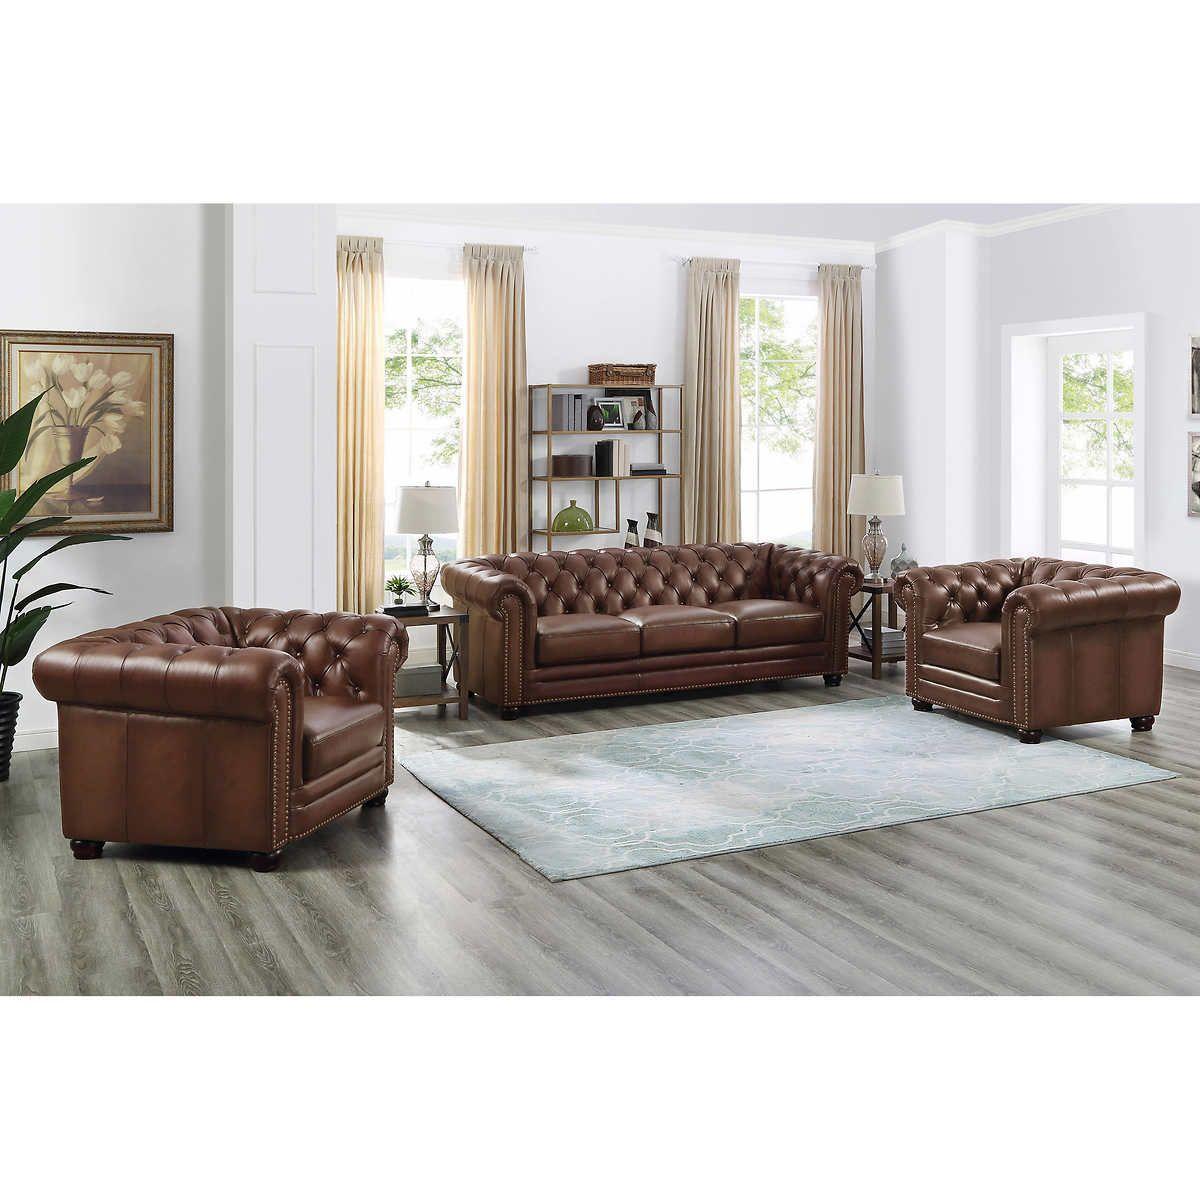 Allington 3piece Top Grain Leather Set Sofa, Chair, Chair